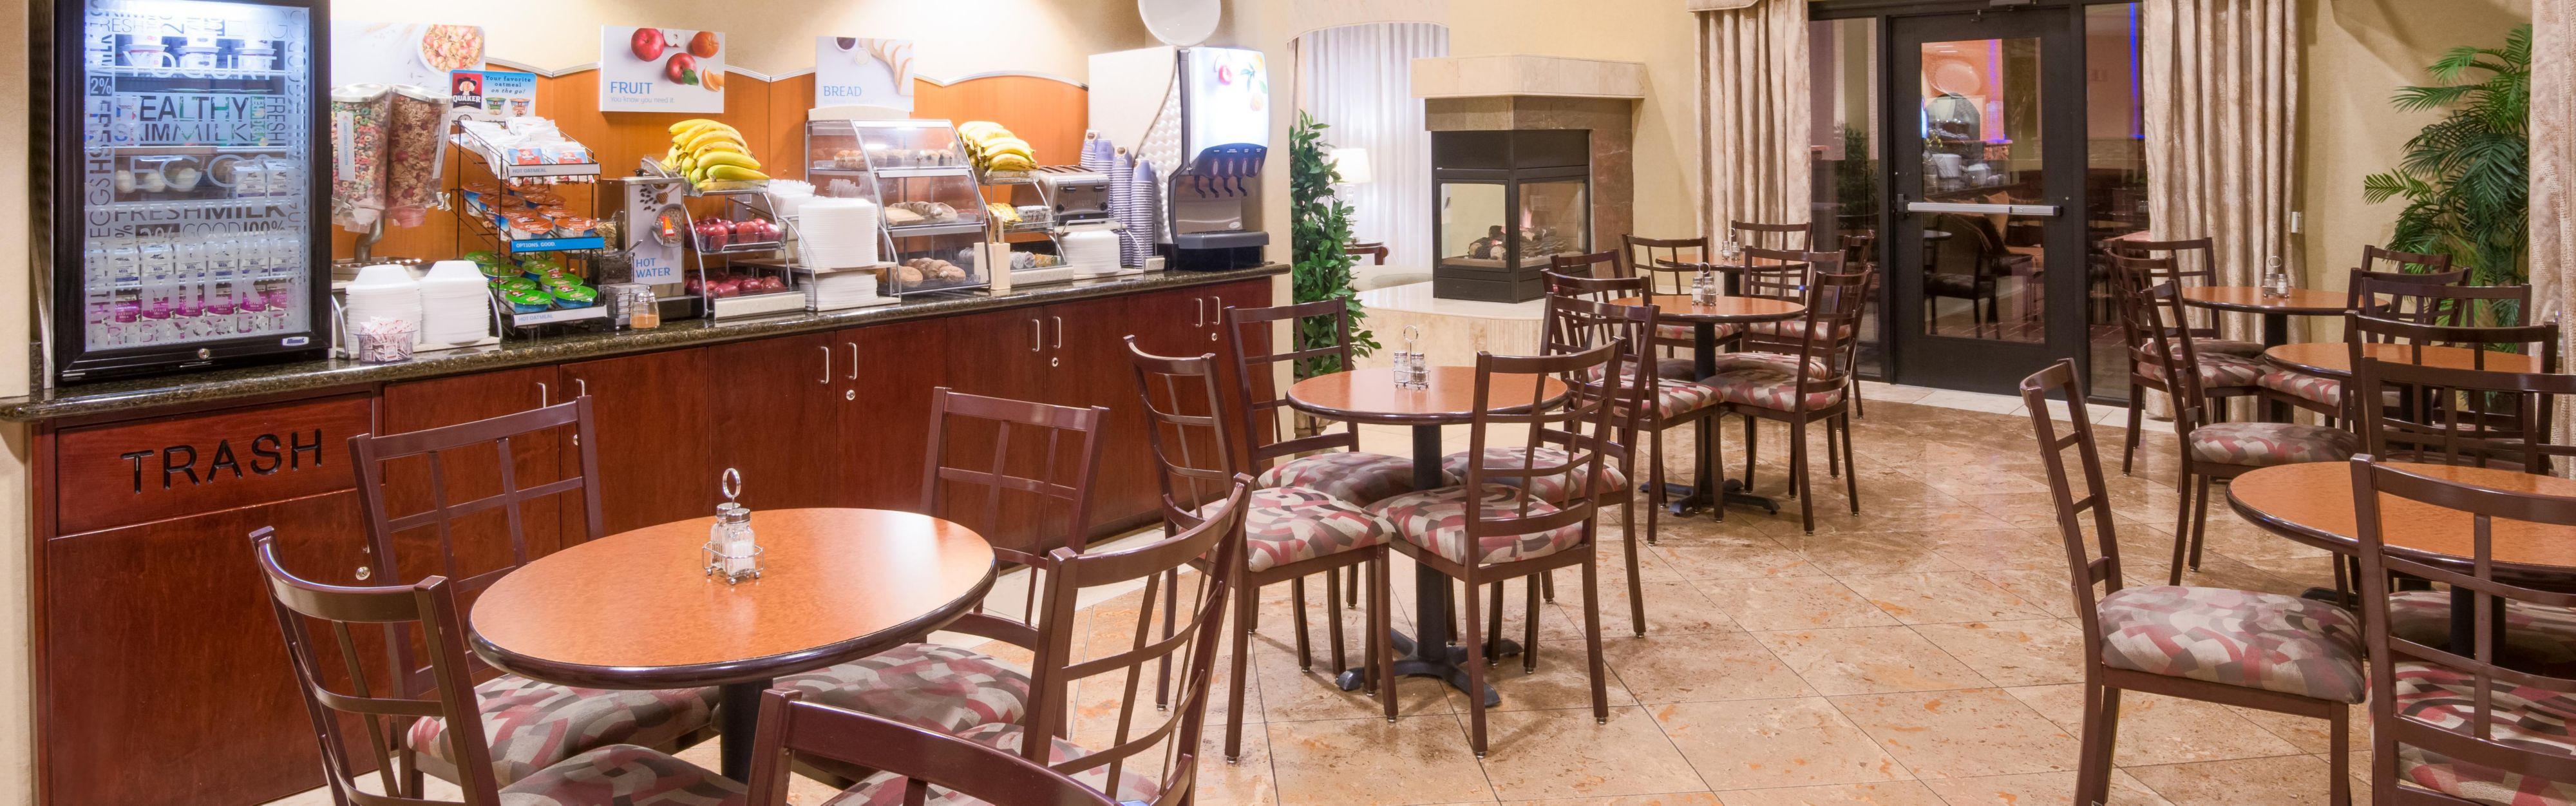 Holiday Inn Express Prescott image 3